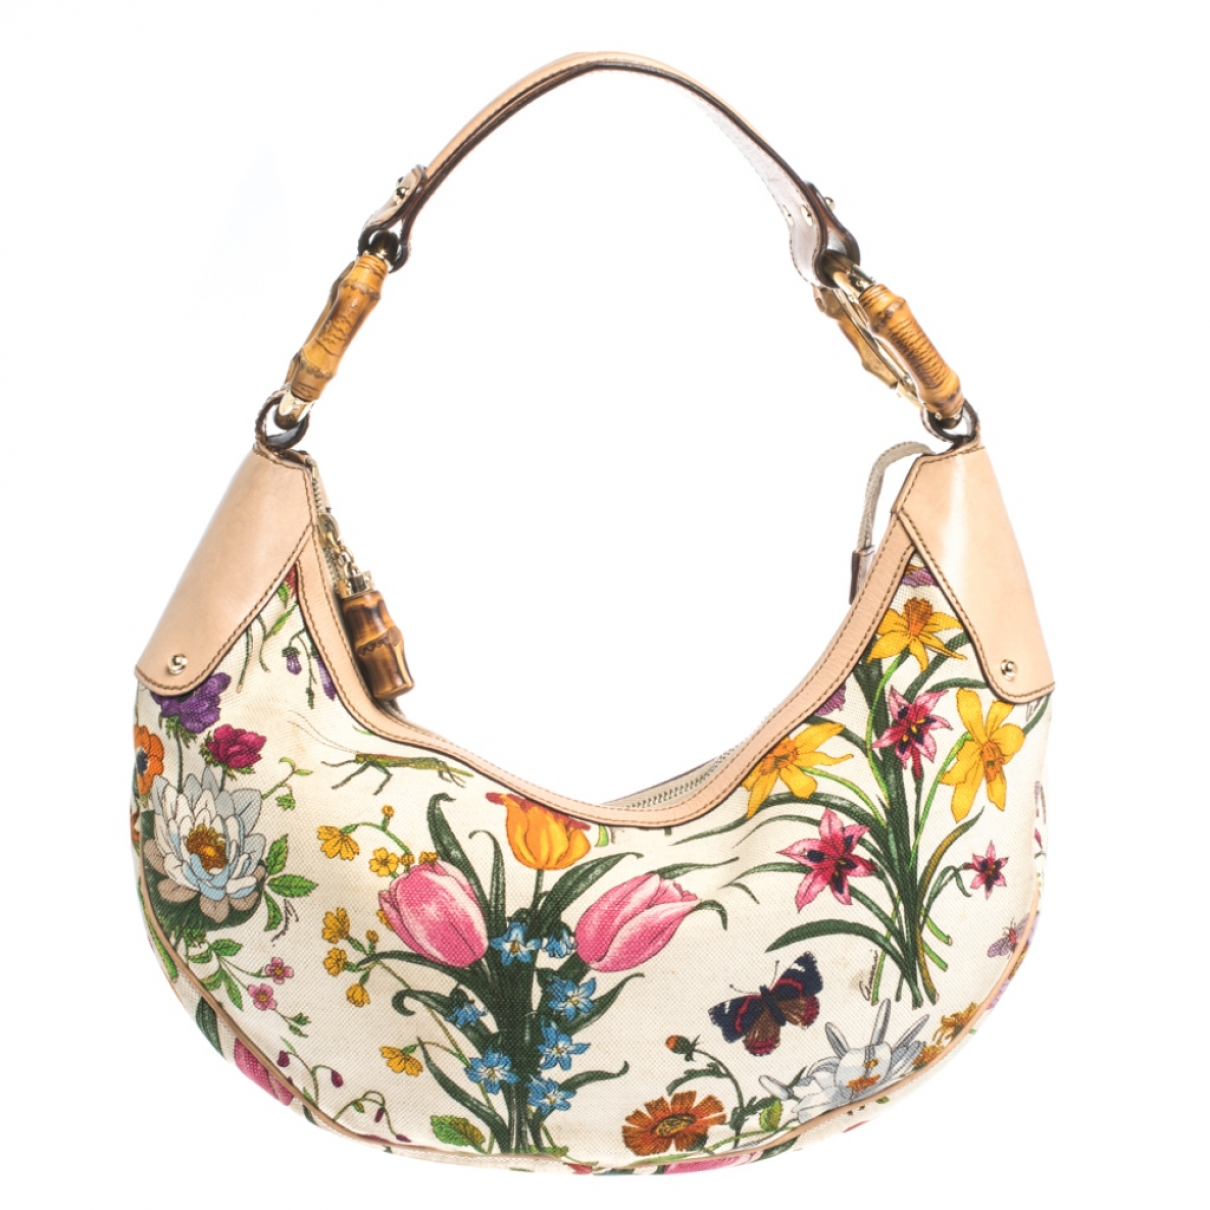 Gucci Bamboo Handtasche in  Bunt Leder